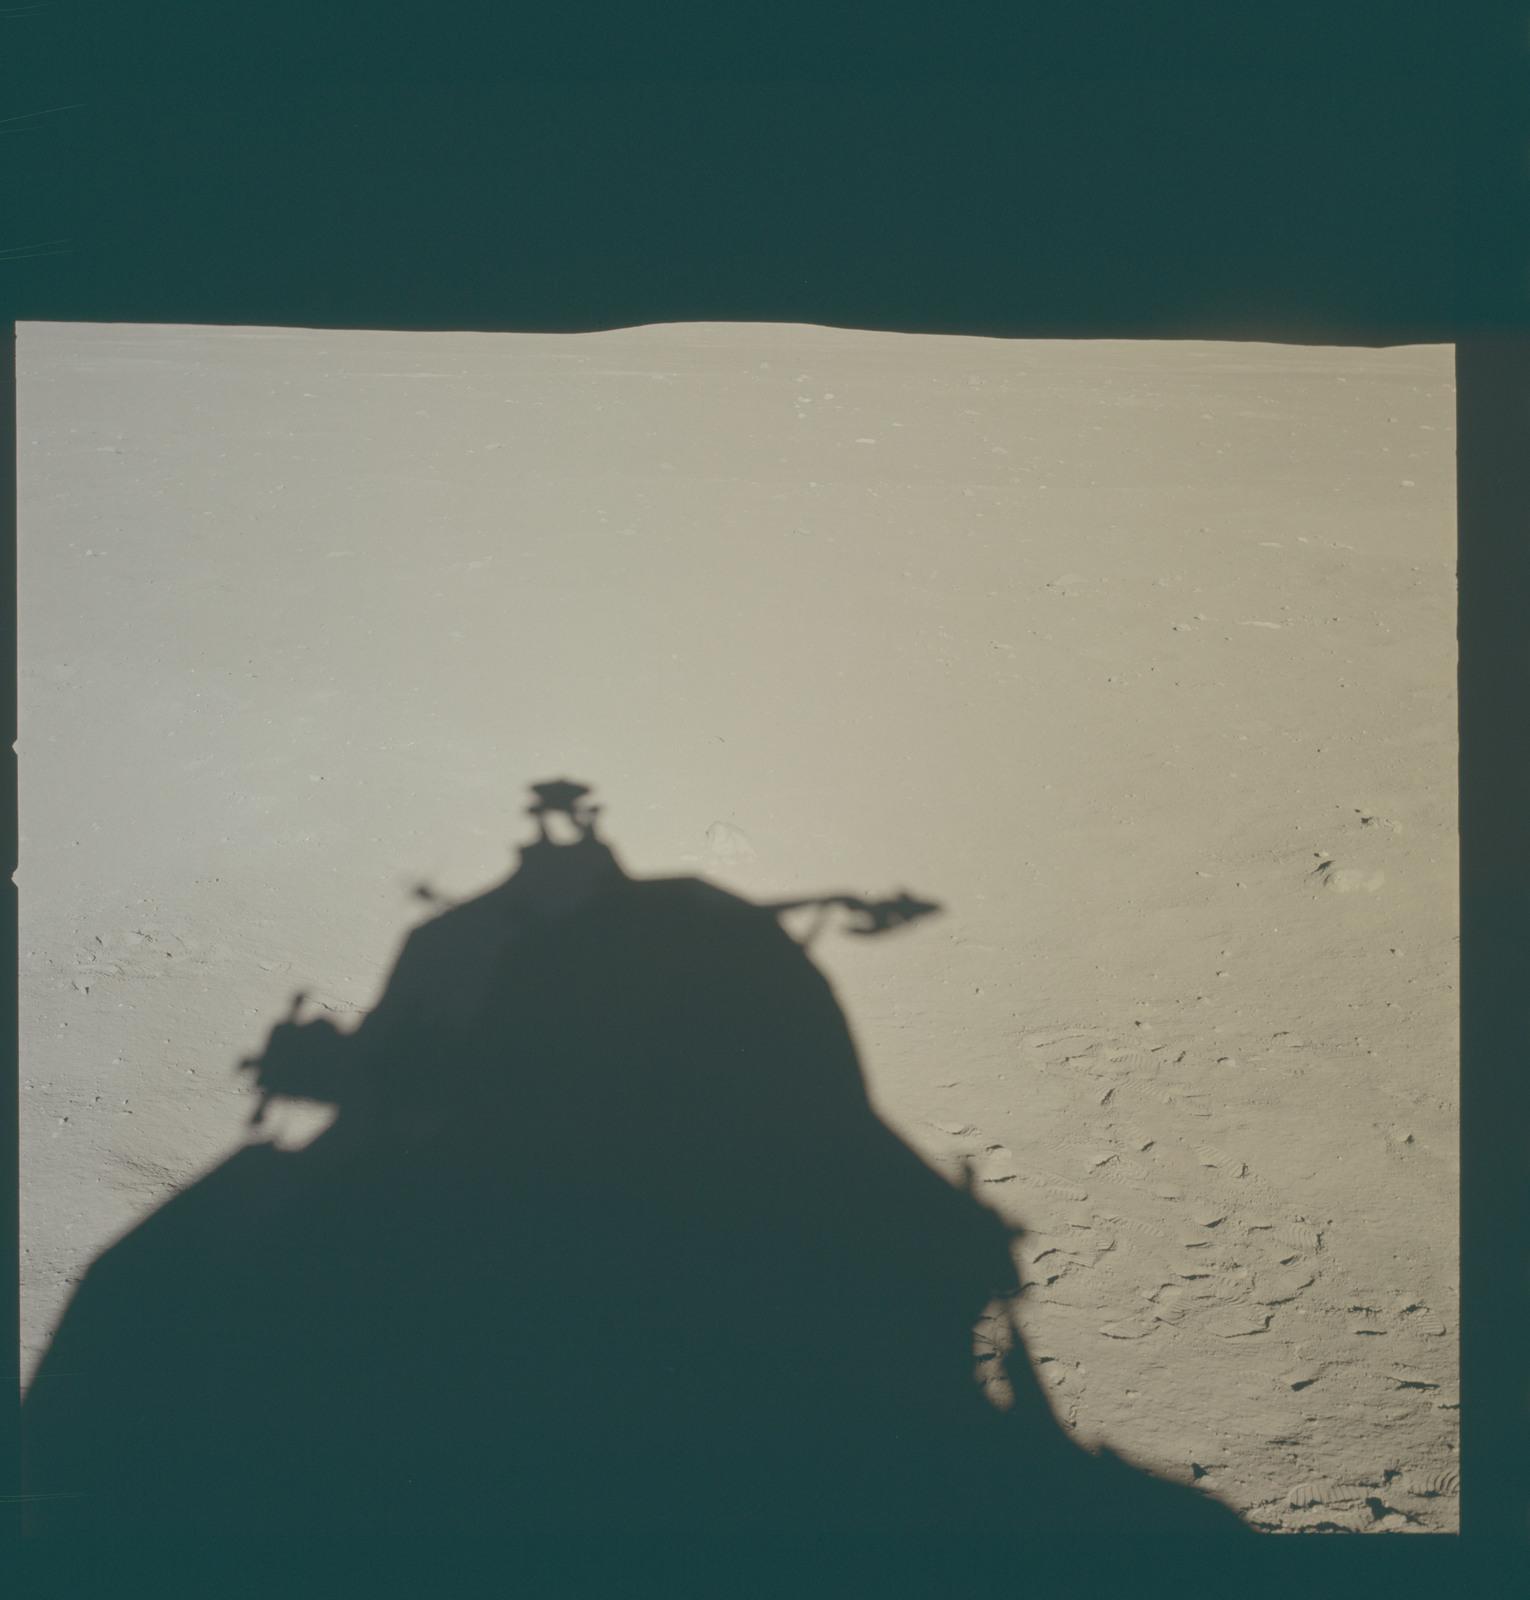 AS11-37-5464 - Apollo 11 - Apollo 11 Mission image - Lunar horizon from Tranquility Base